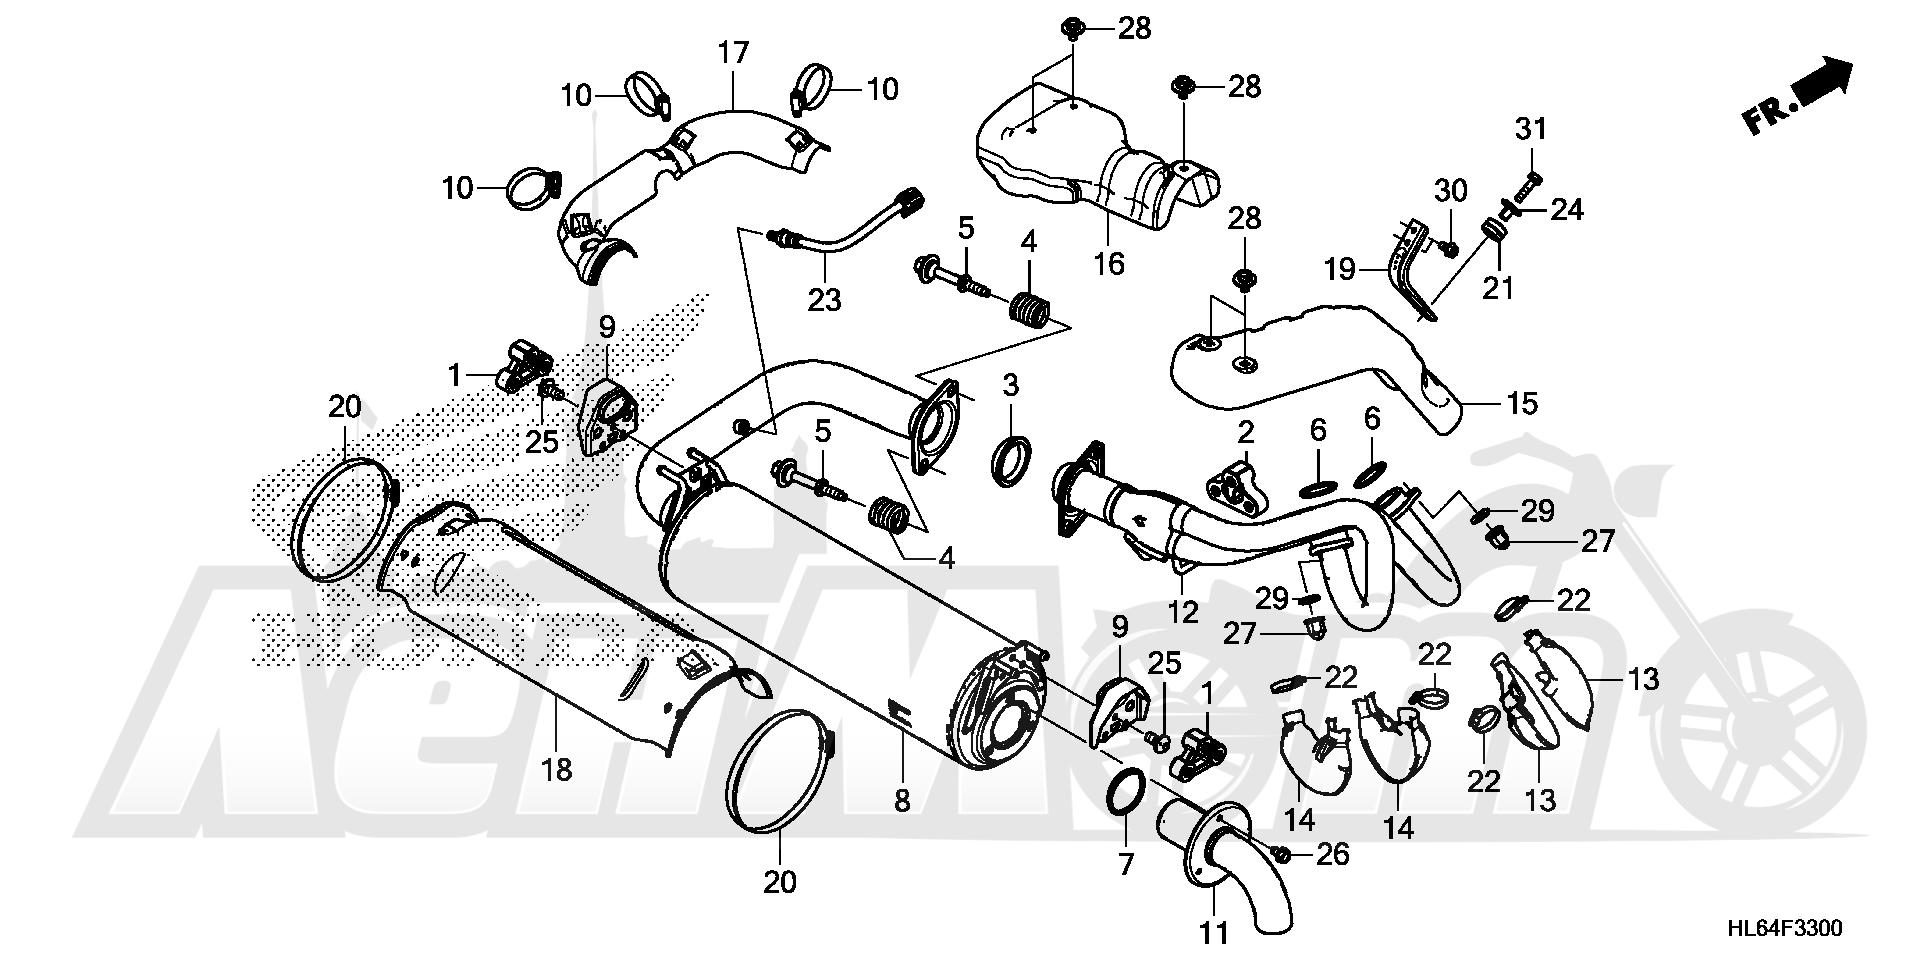 Запчасти для Квадроцикла Honda 2019 SXS1000S2R Раздел: MUFFLER | глушитель